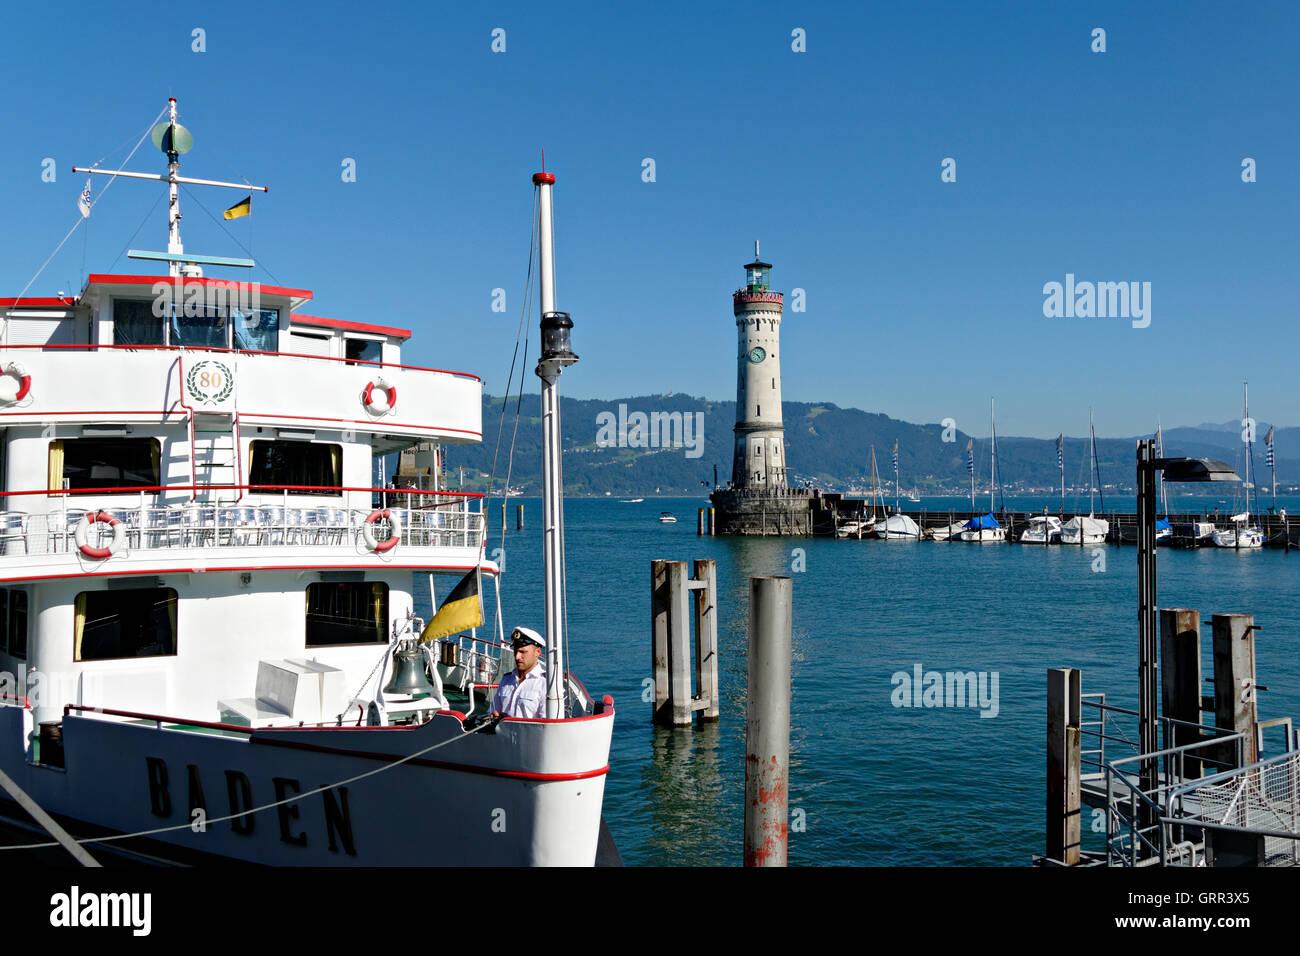 Ferry boat crewman setting flag, Lindau, Swabia, Bavaria, Germany, Europe Stock Photo